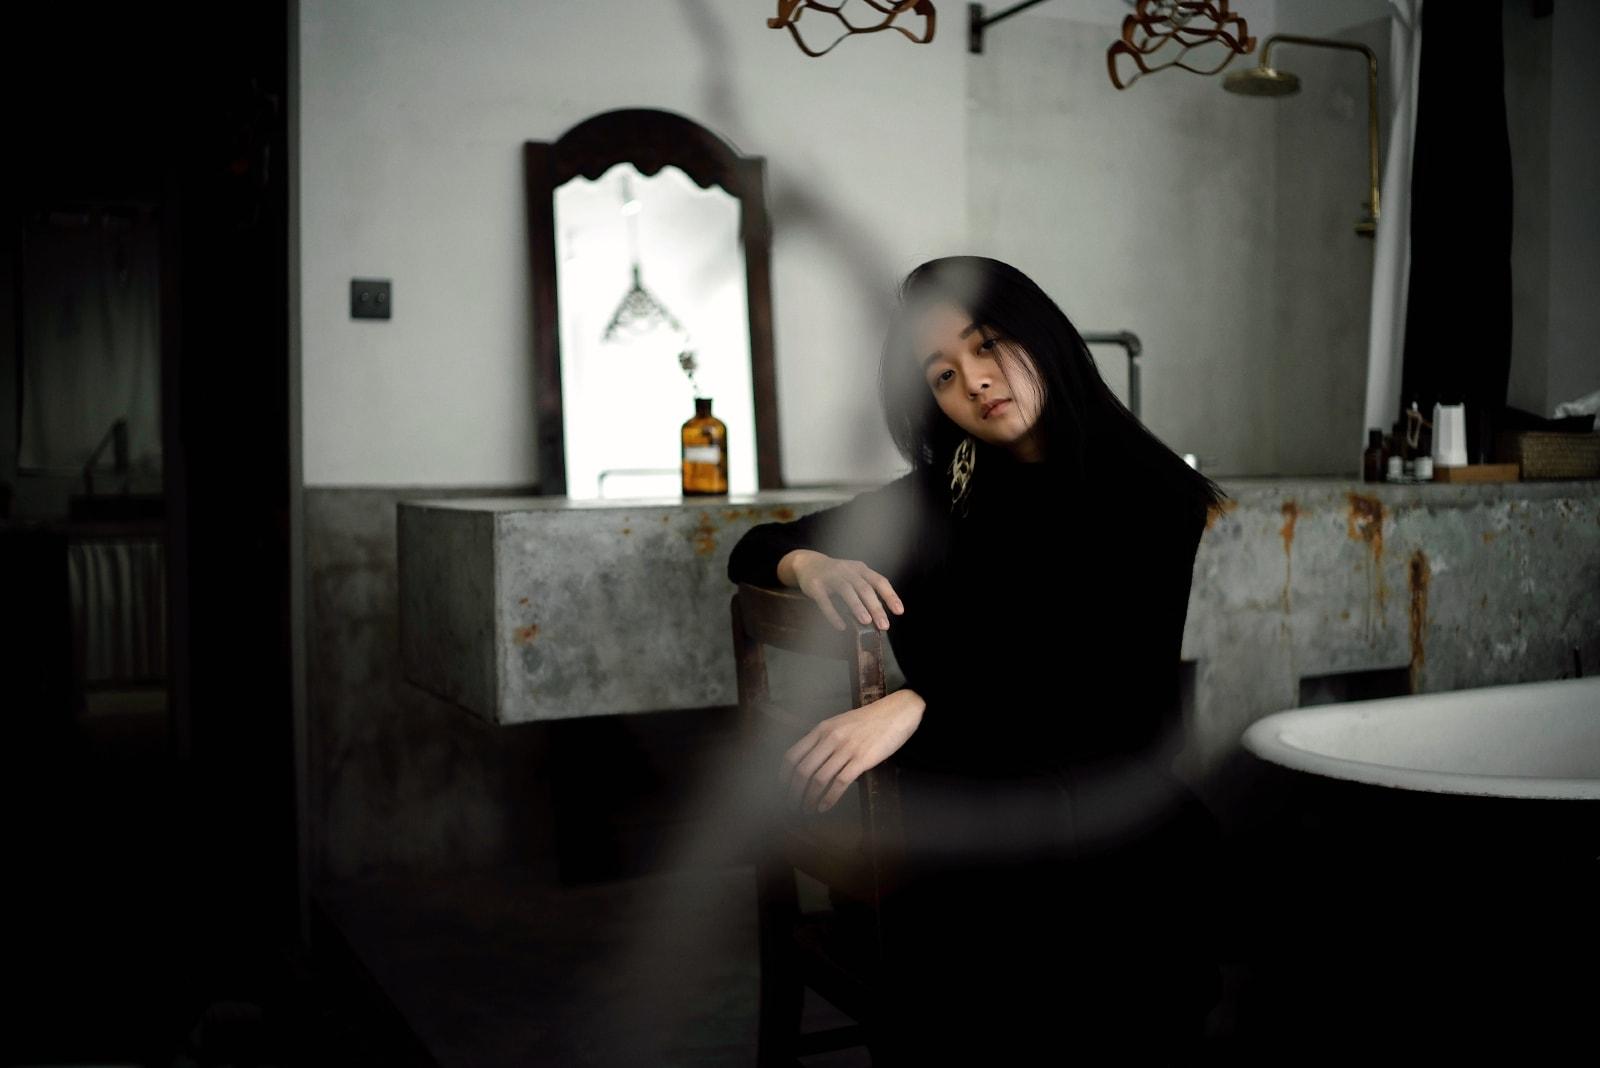 sad woman sitting on chair near mirror